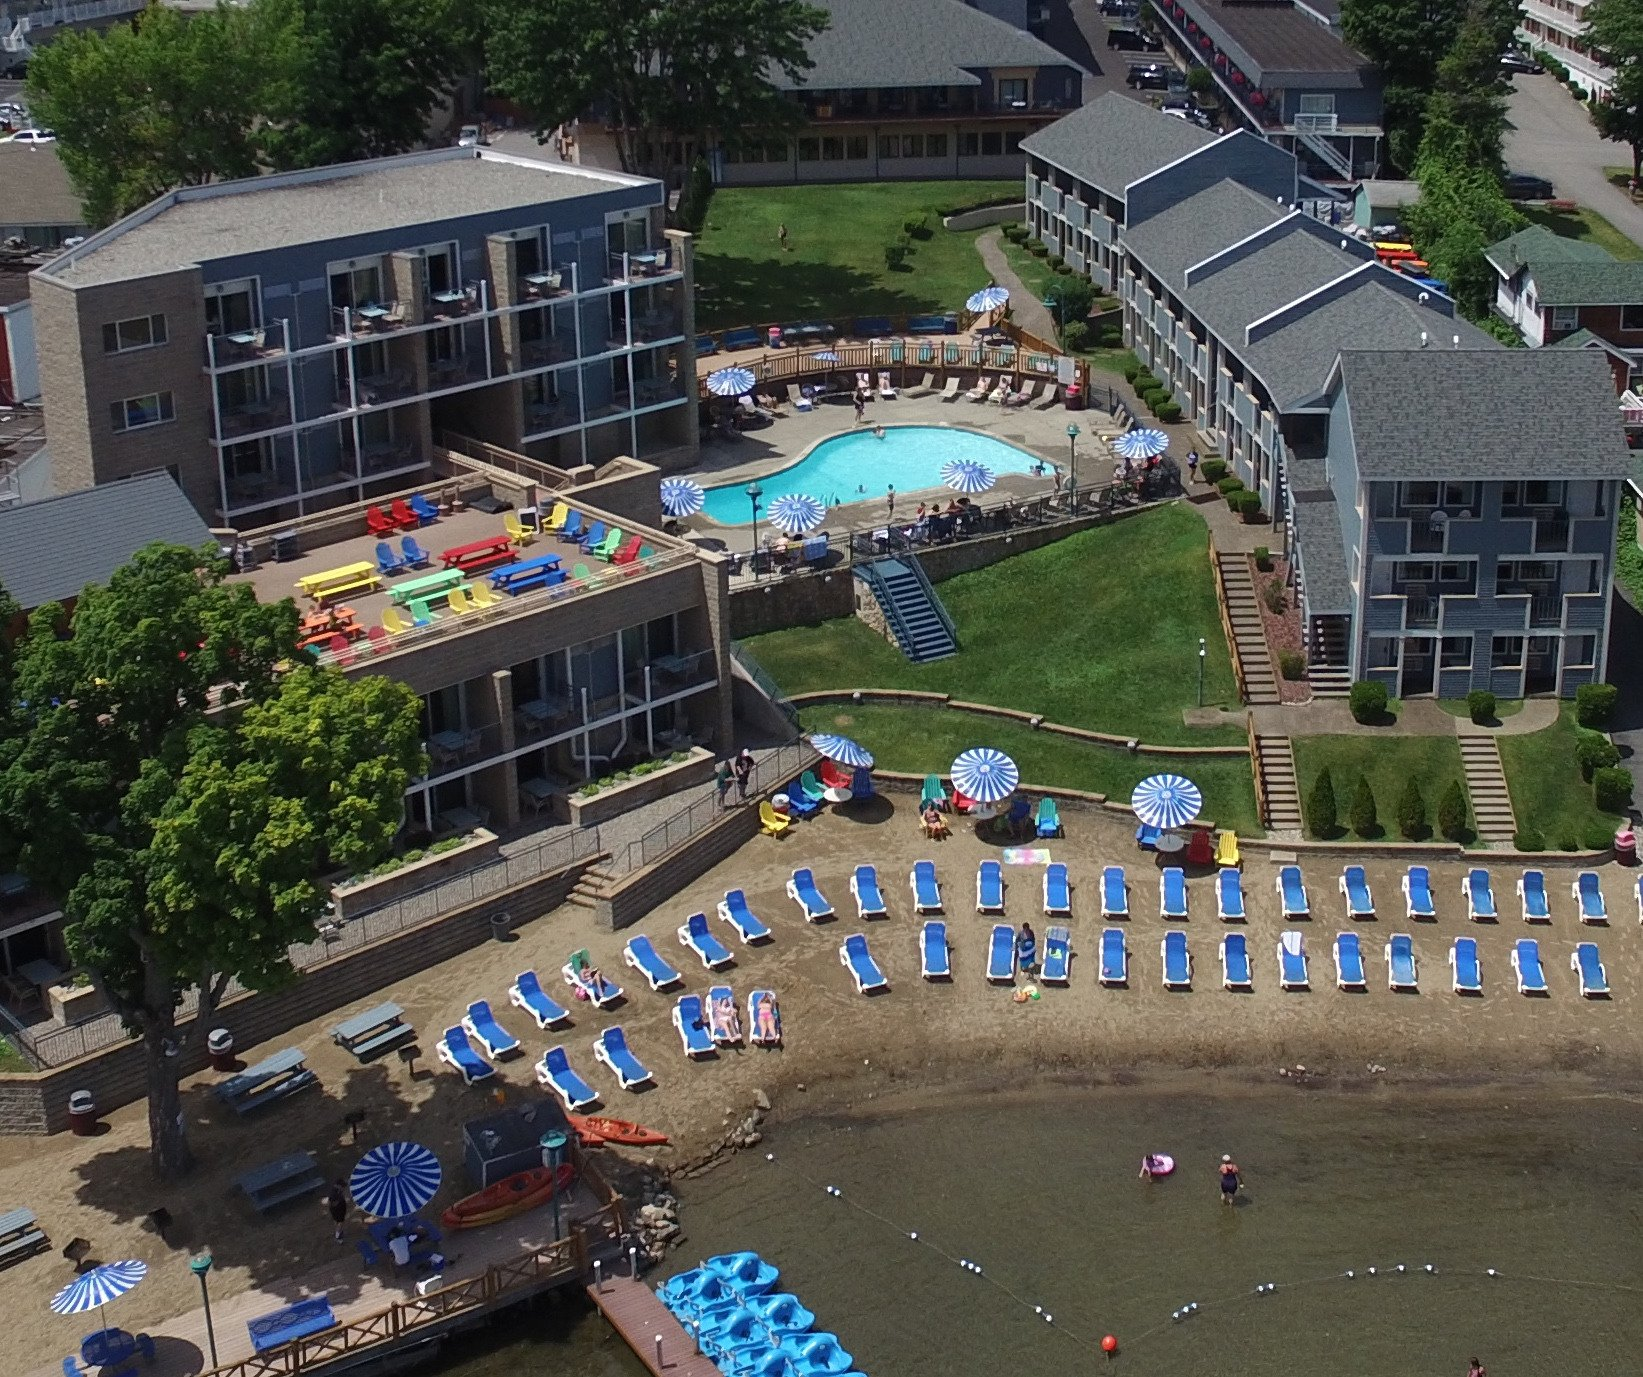 Surfside On The Lake Hotel & Suites